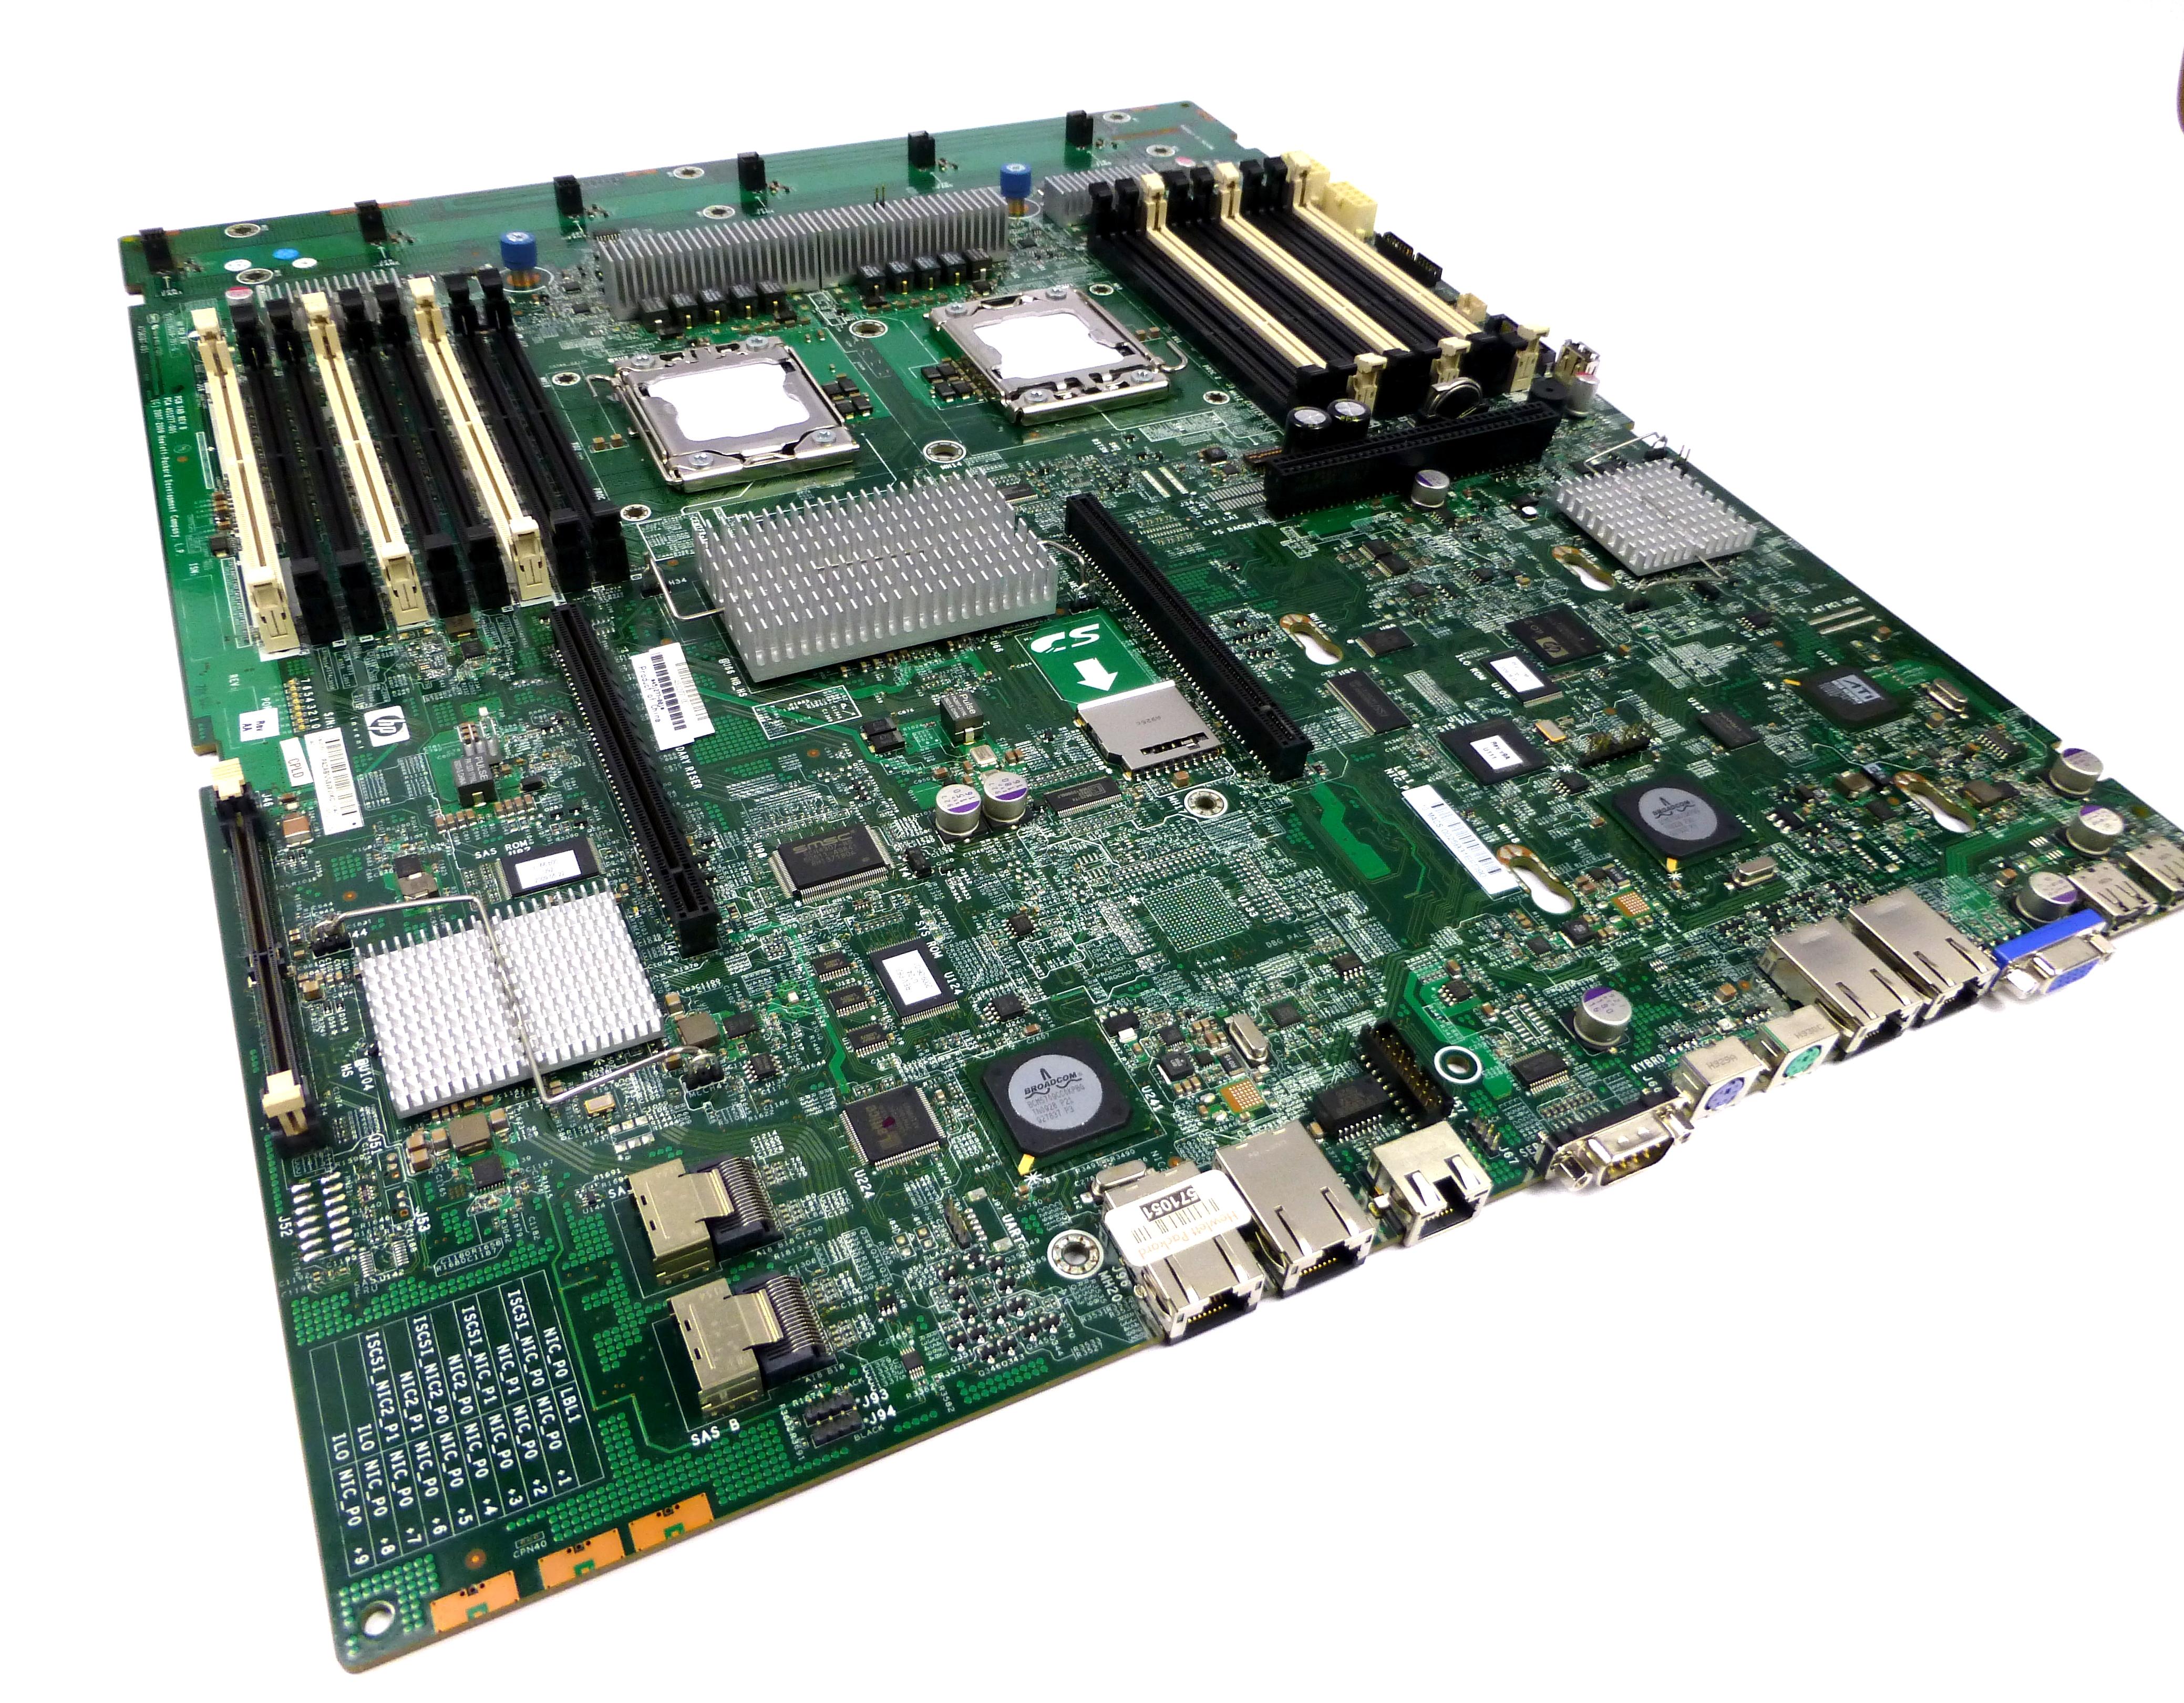 HP 496069-001 Proliant DL380 G6 System Board - 451277-001